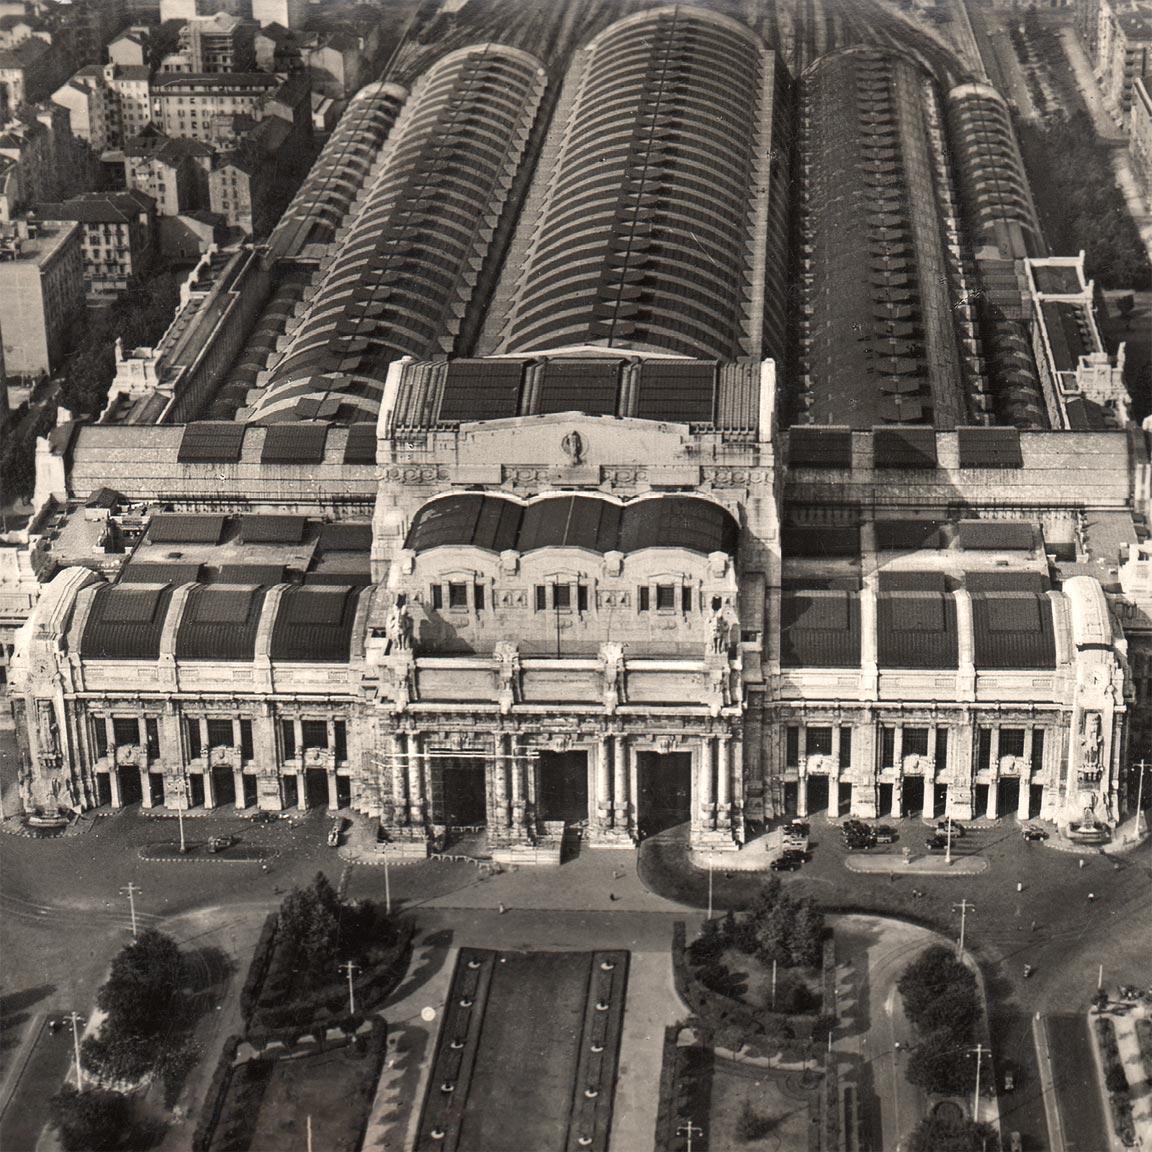 Milano centrale milaans megalomane station met een snufje - Da porta garibaldi a milano centrale ...